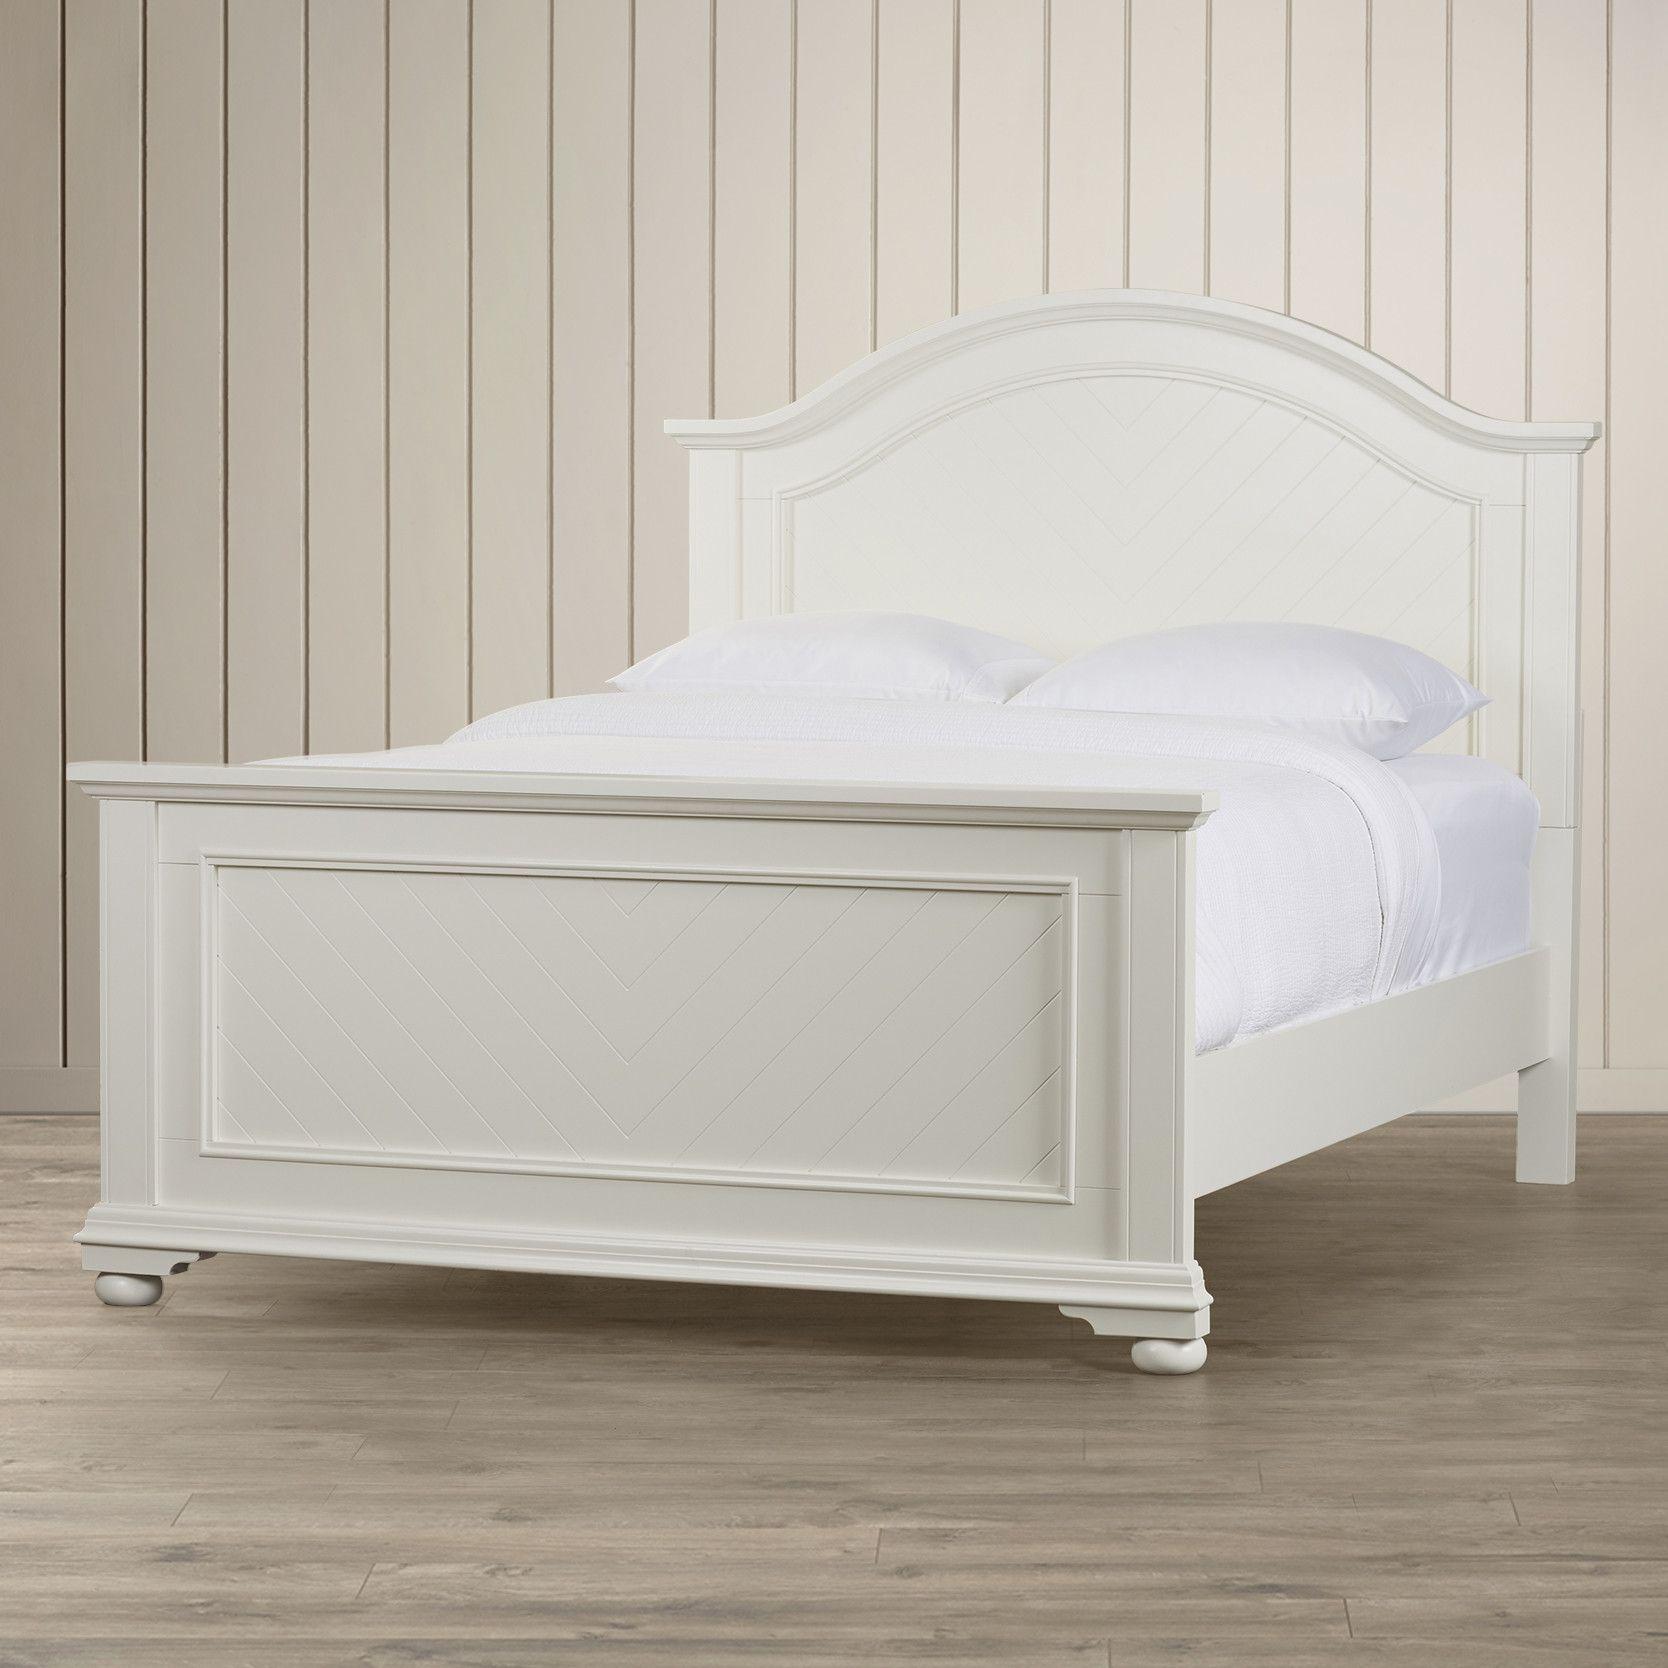 Aiden Bed Twin Beds Guest Room Bed Design Kids Bed Design